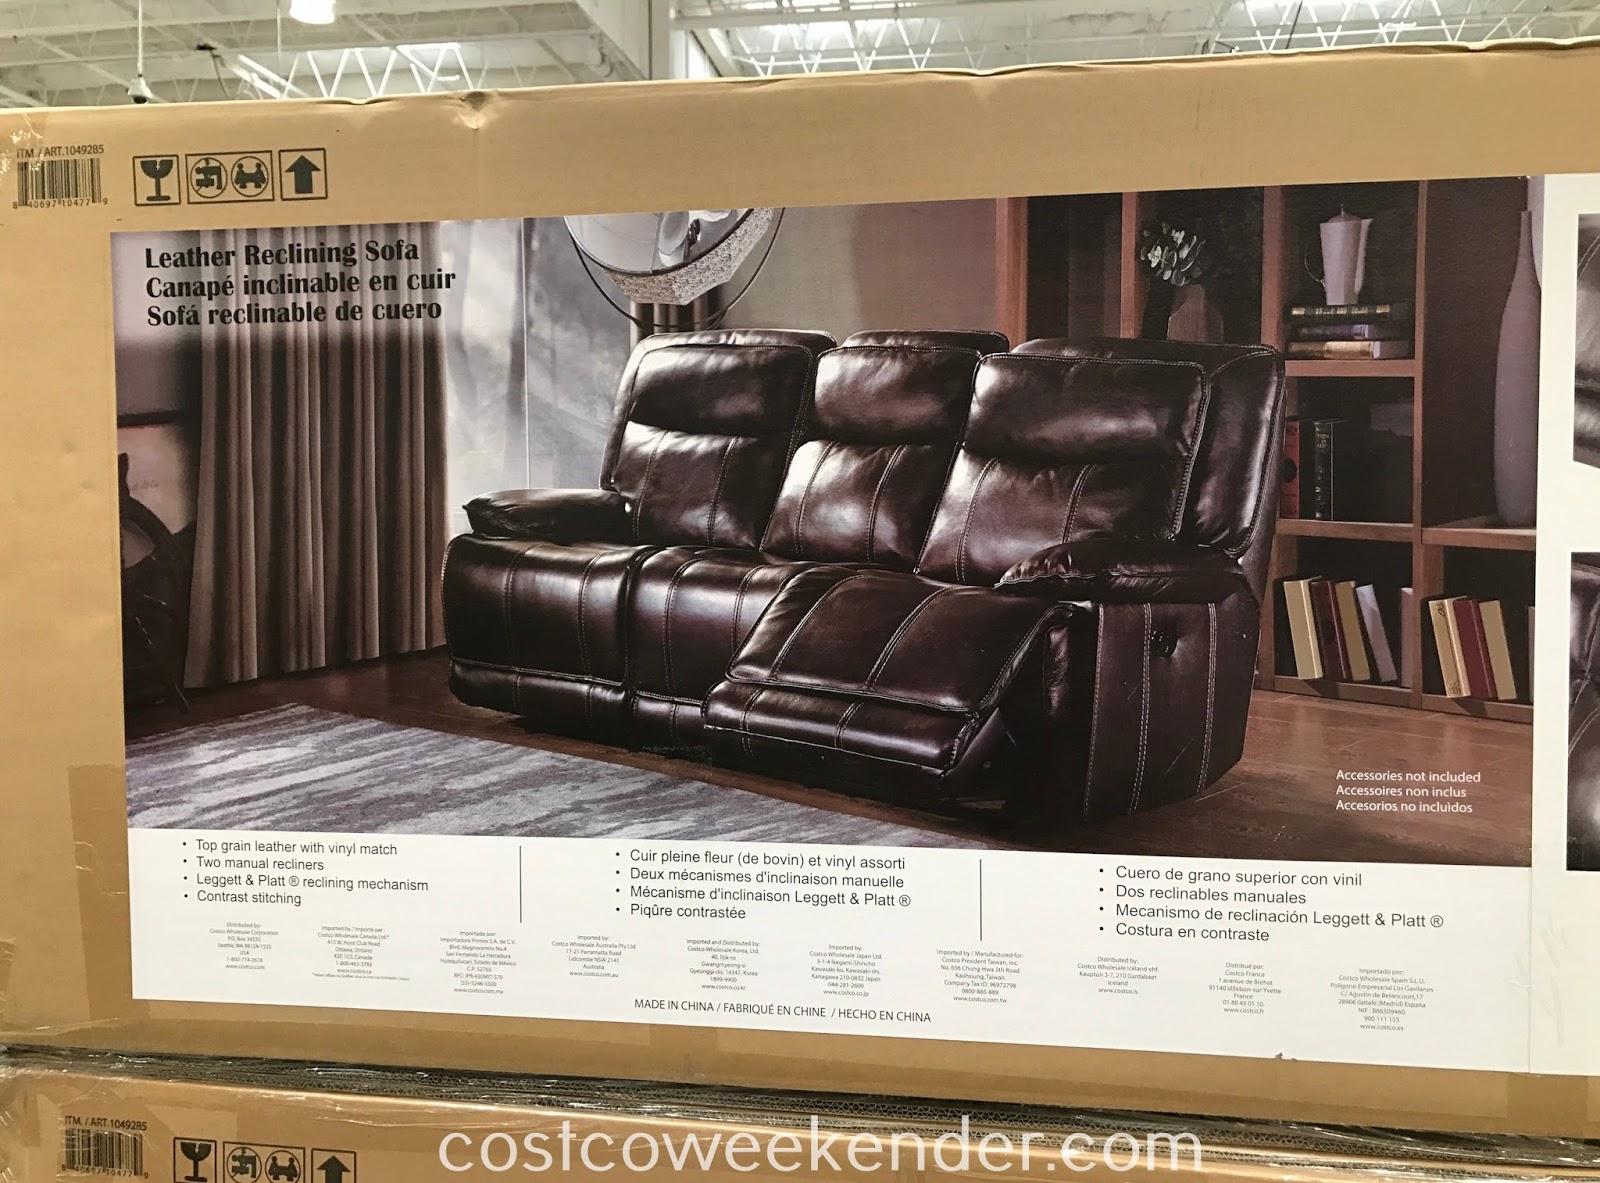 leather reclining sofa costco weekender